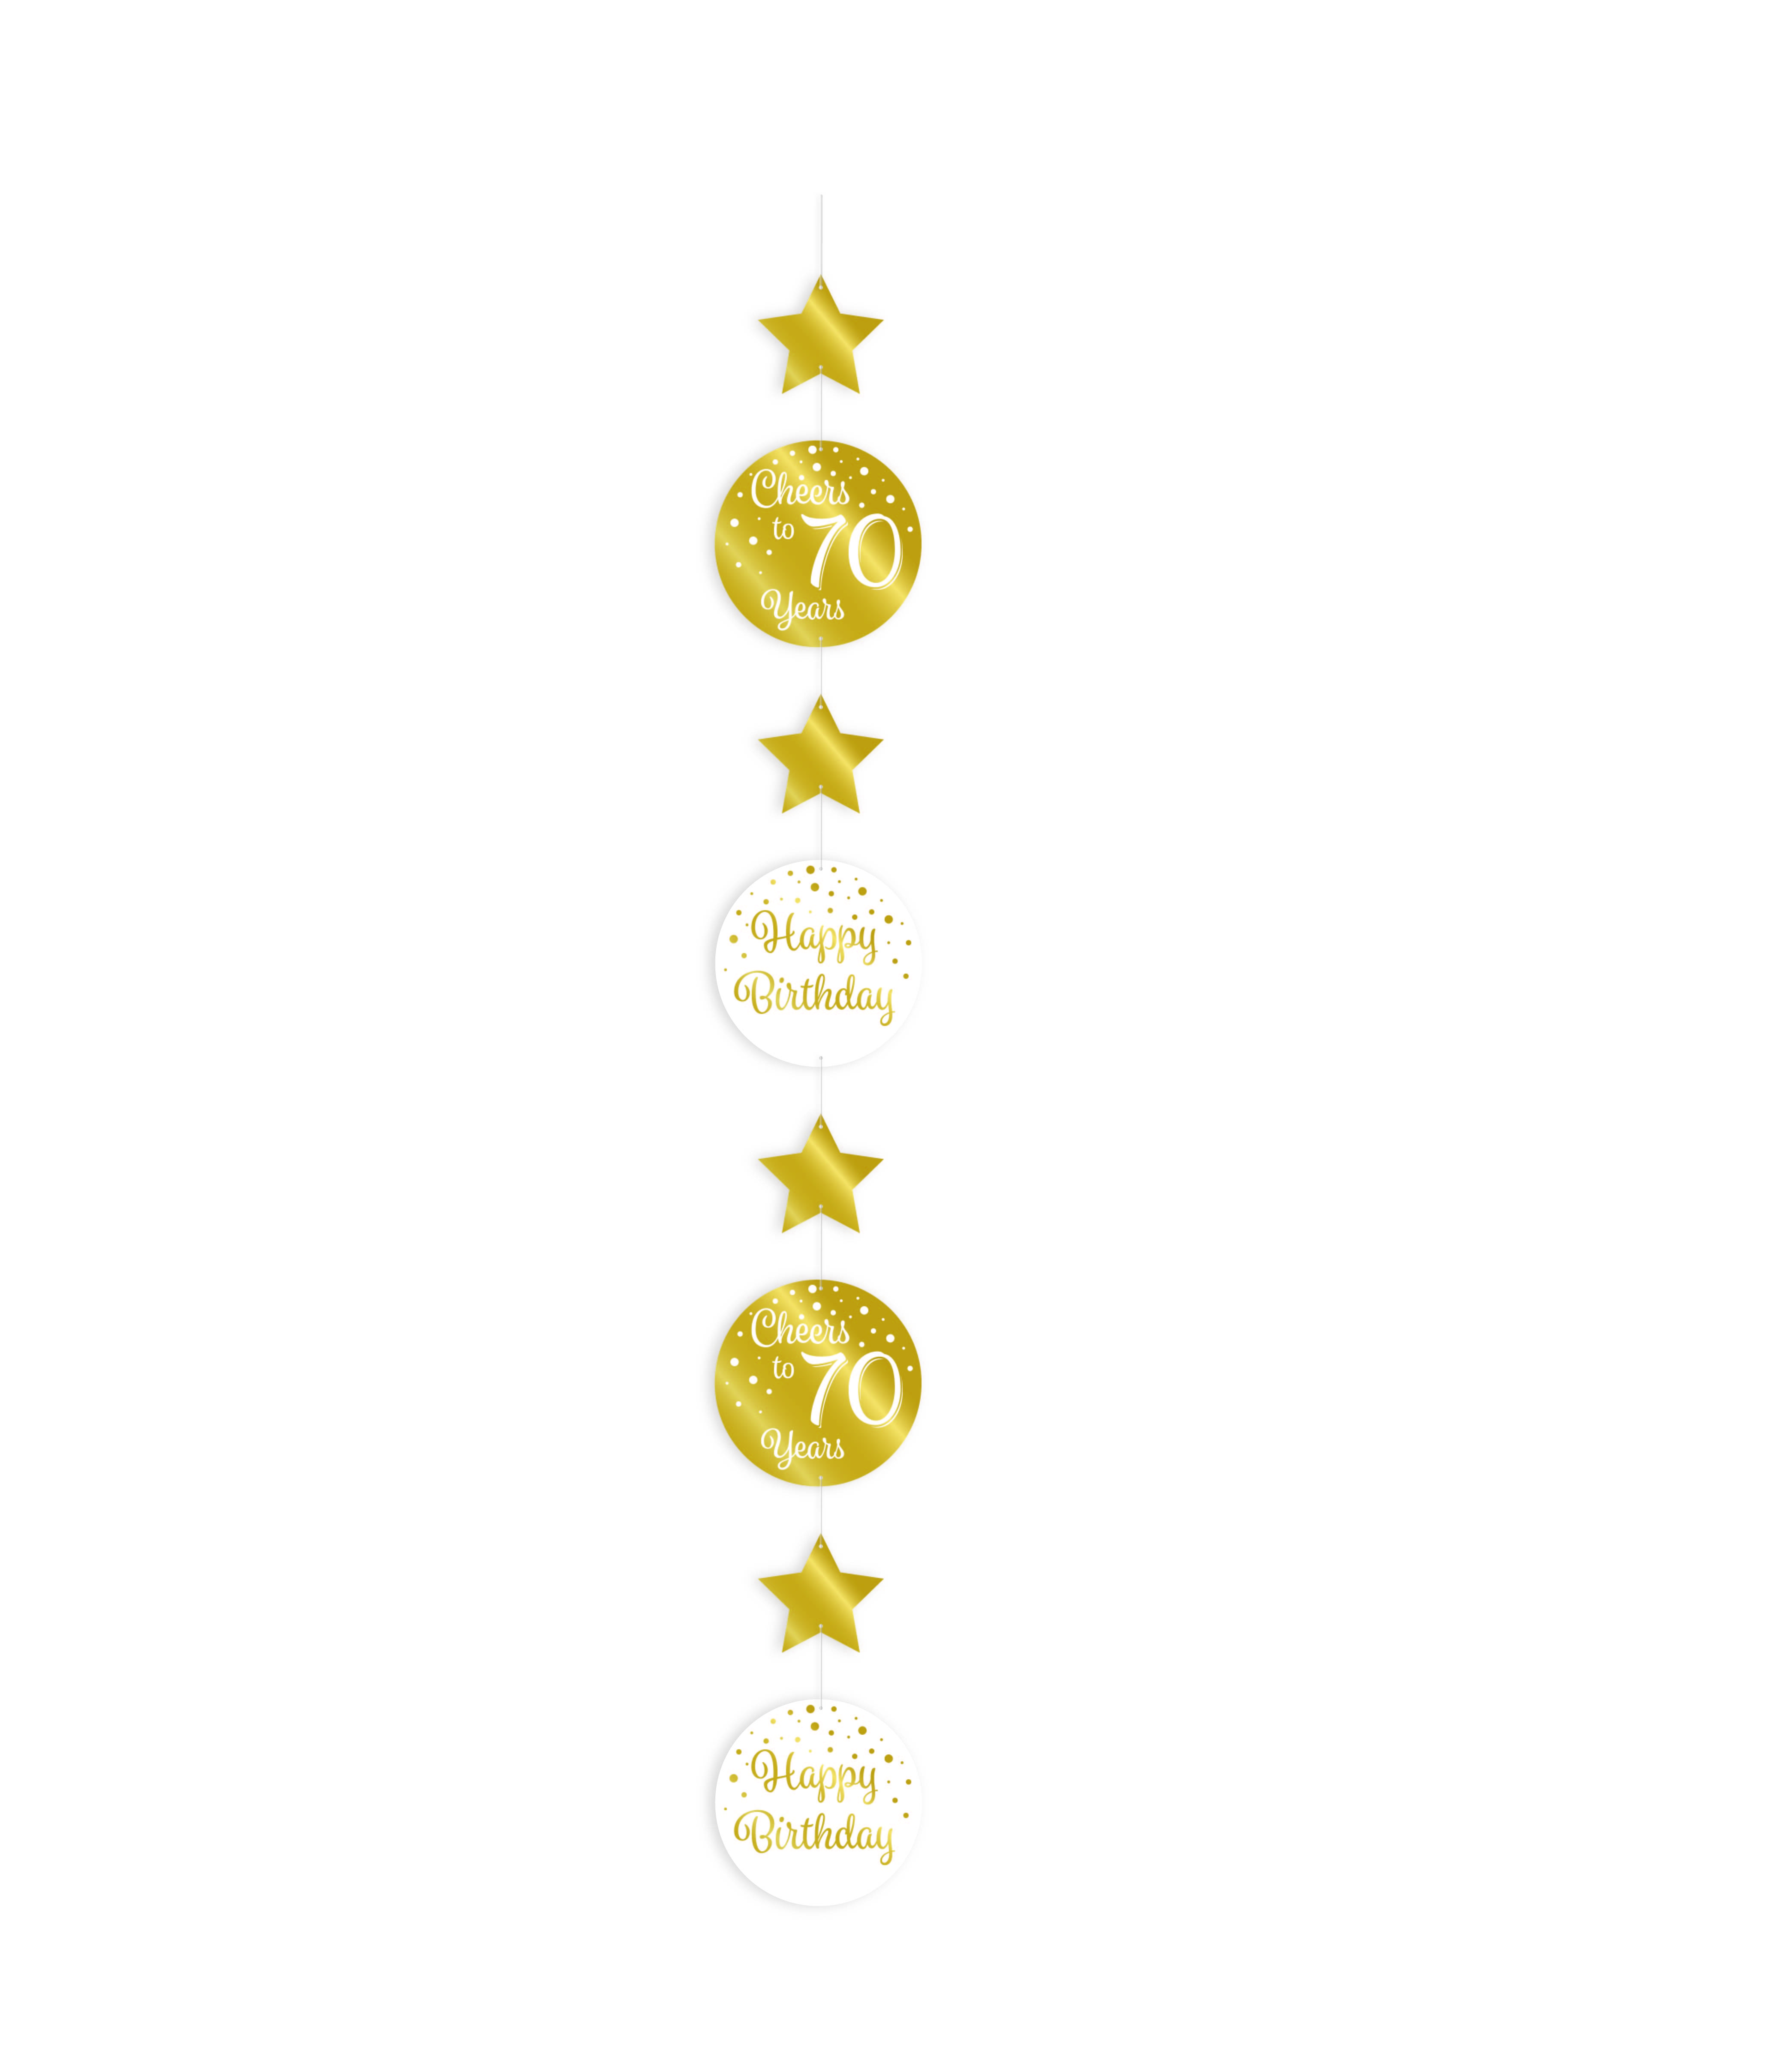 Hangdecoratie Goud/Wit Cheers to 70 Years